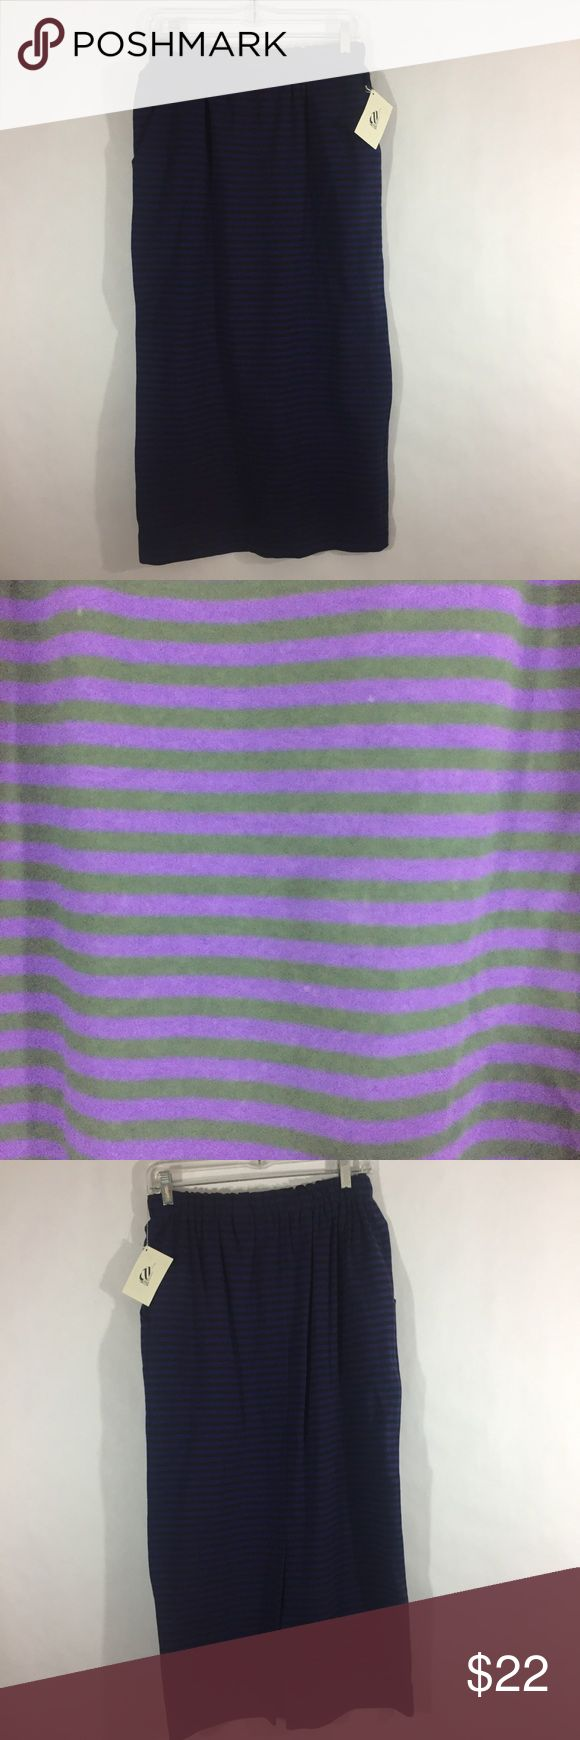 "NWT Nautica striped maxi skirt New with tags purple and black striped maxi skirt by Nautica.  Elastic waistband, side seam pockets, 12"" back slit. 100% cotton.  Machine washable. Waist: 13.5"" Length: 34"" Nautica Skirts Maxi"